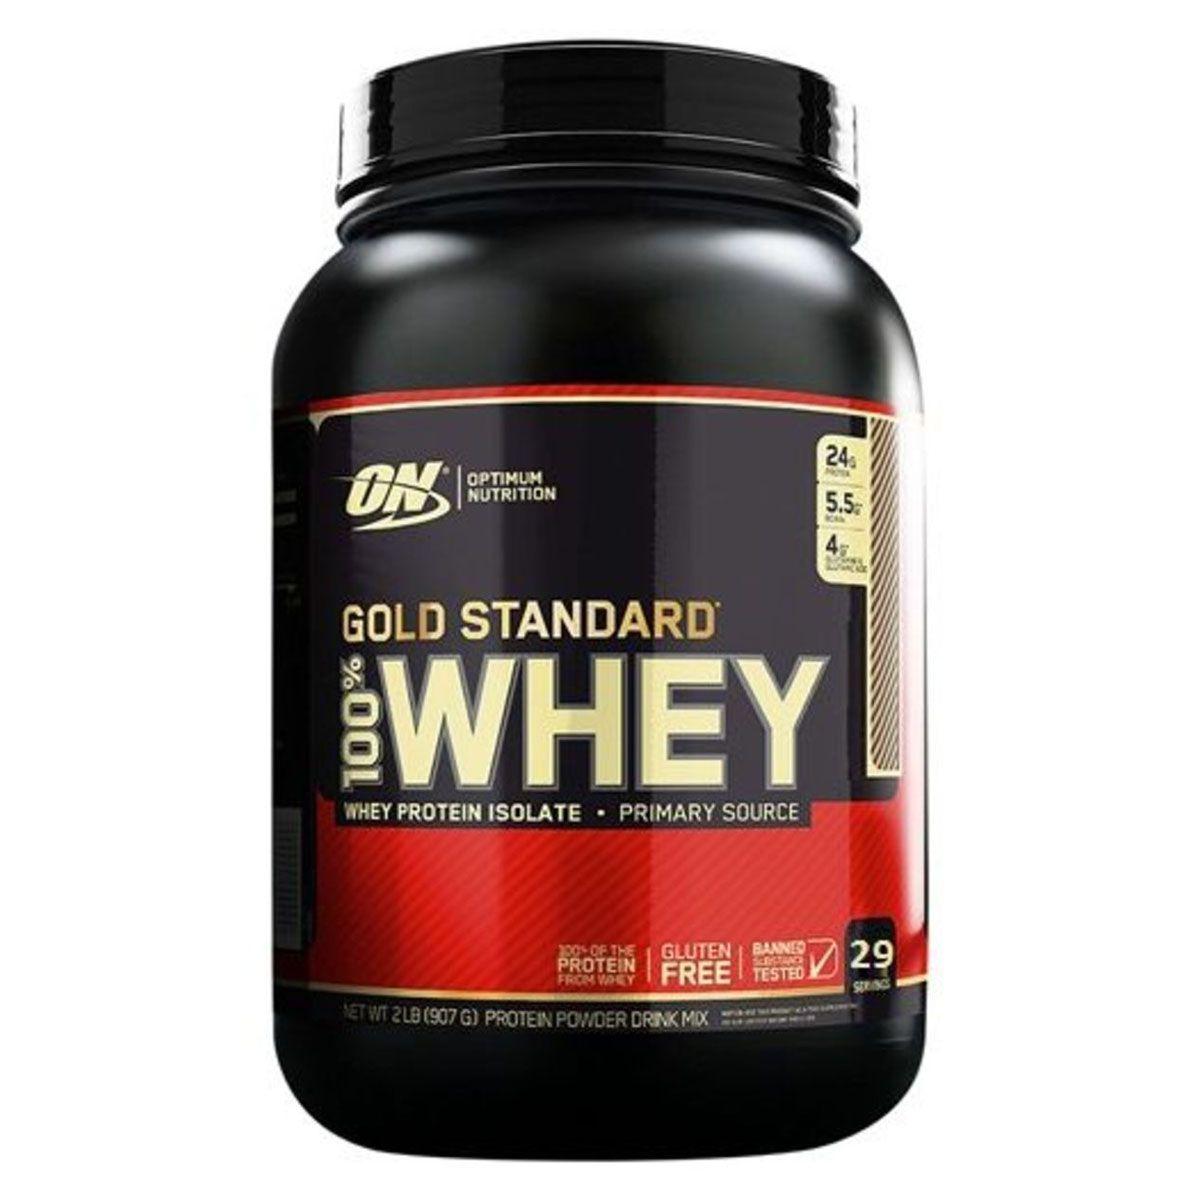 Gold Standard 900g - Optimum Nutrition